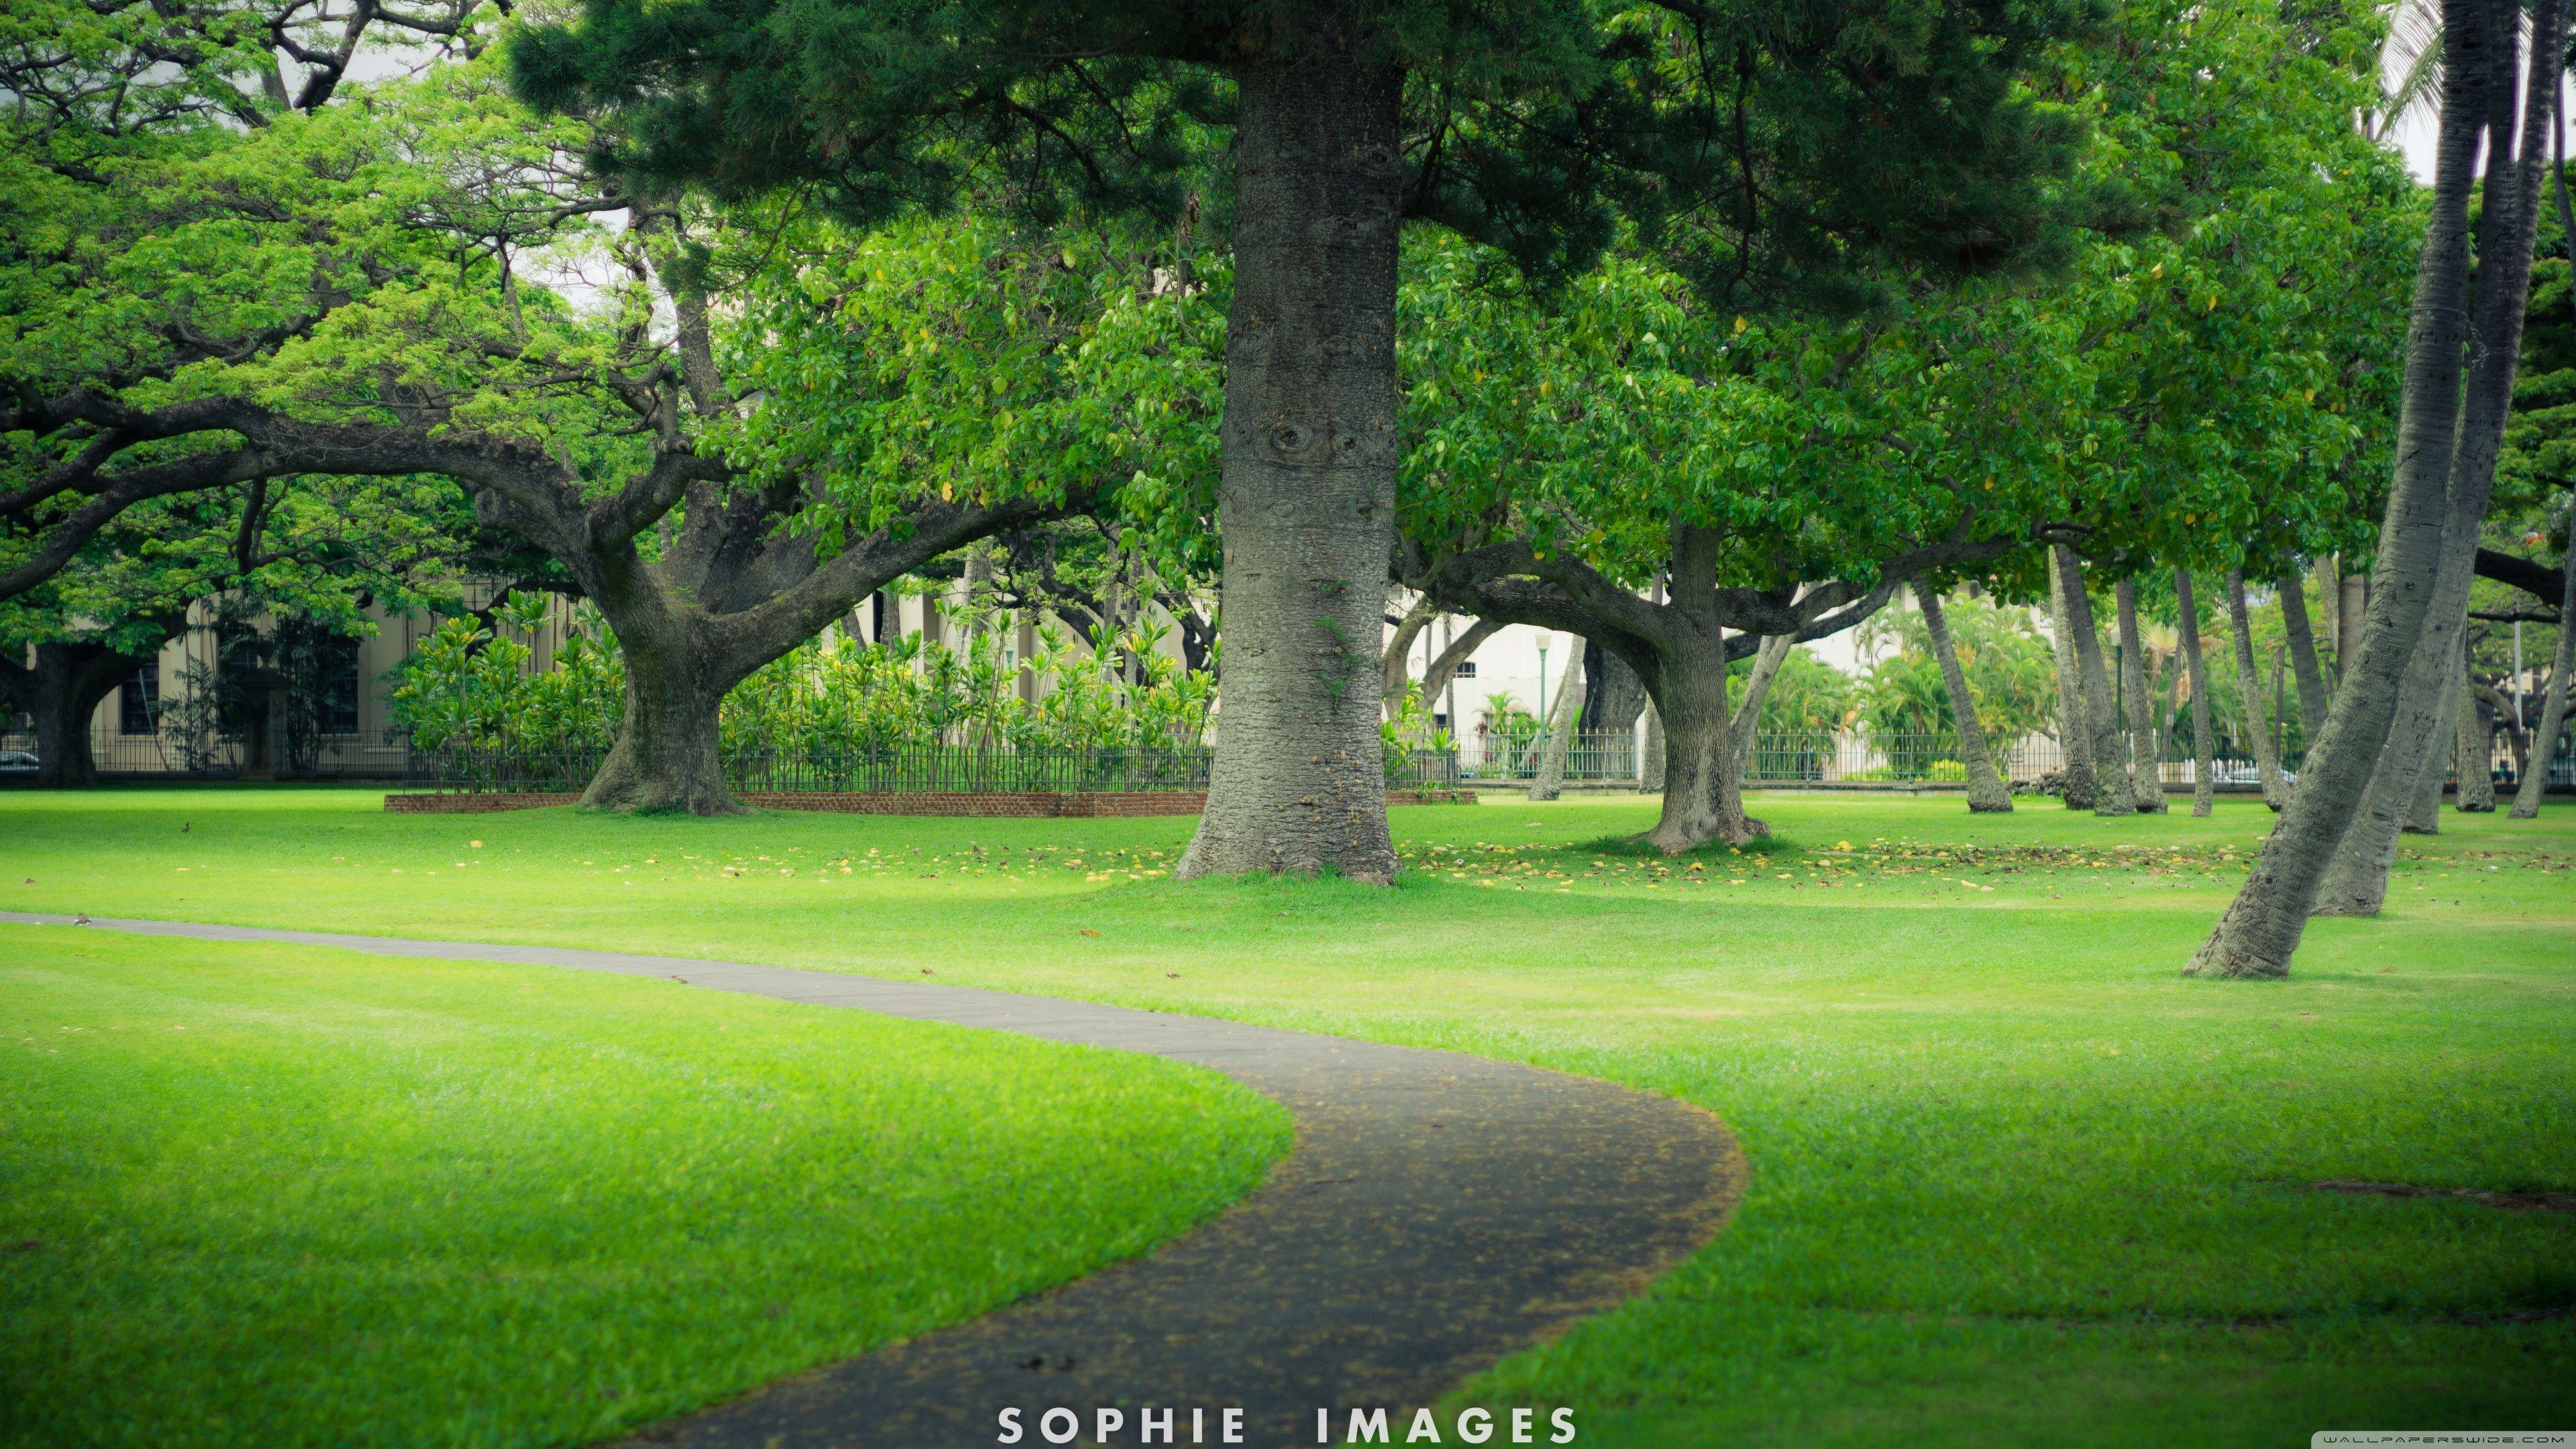 Hawaii 4k Wallpapers Top Free Hawaii 4k Backgrounds Wallpaperaccess